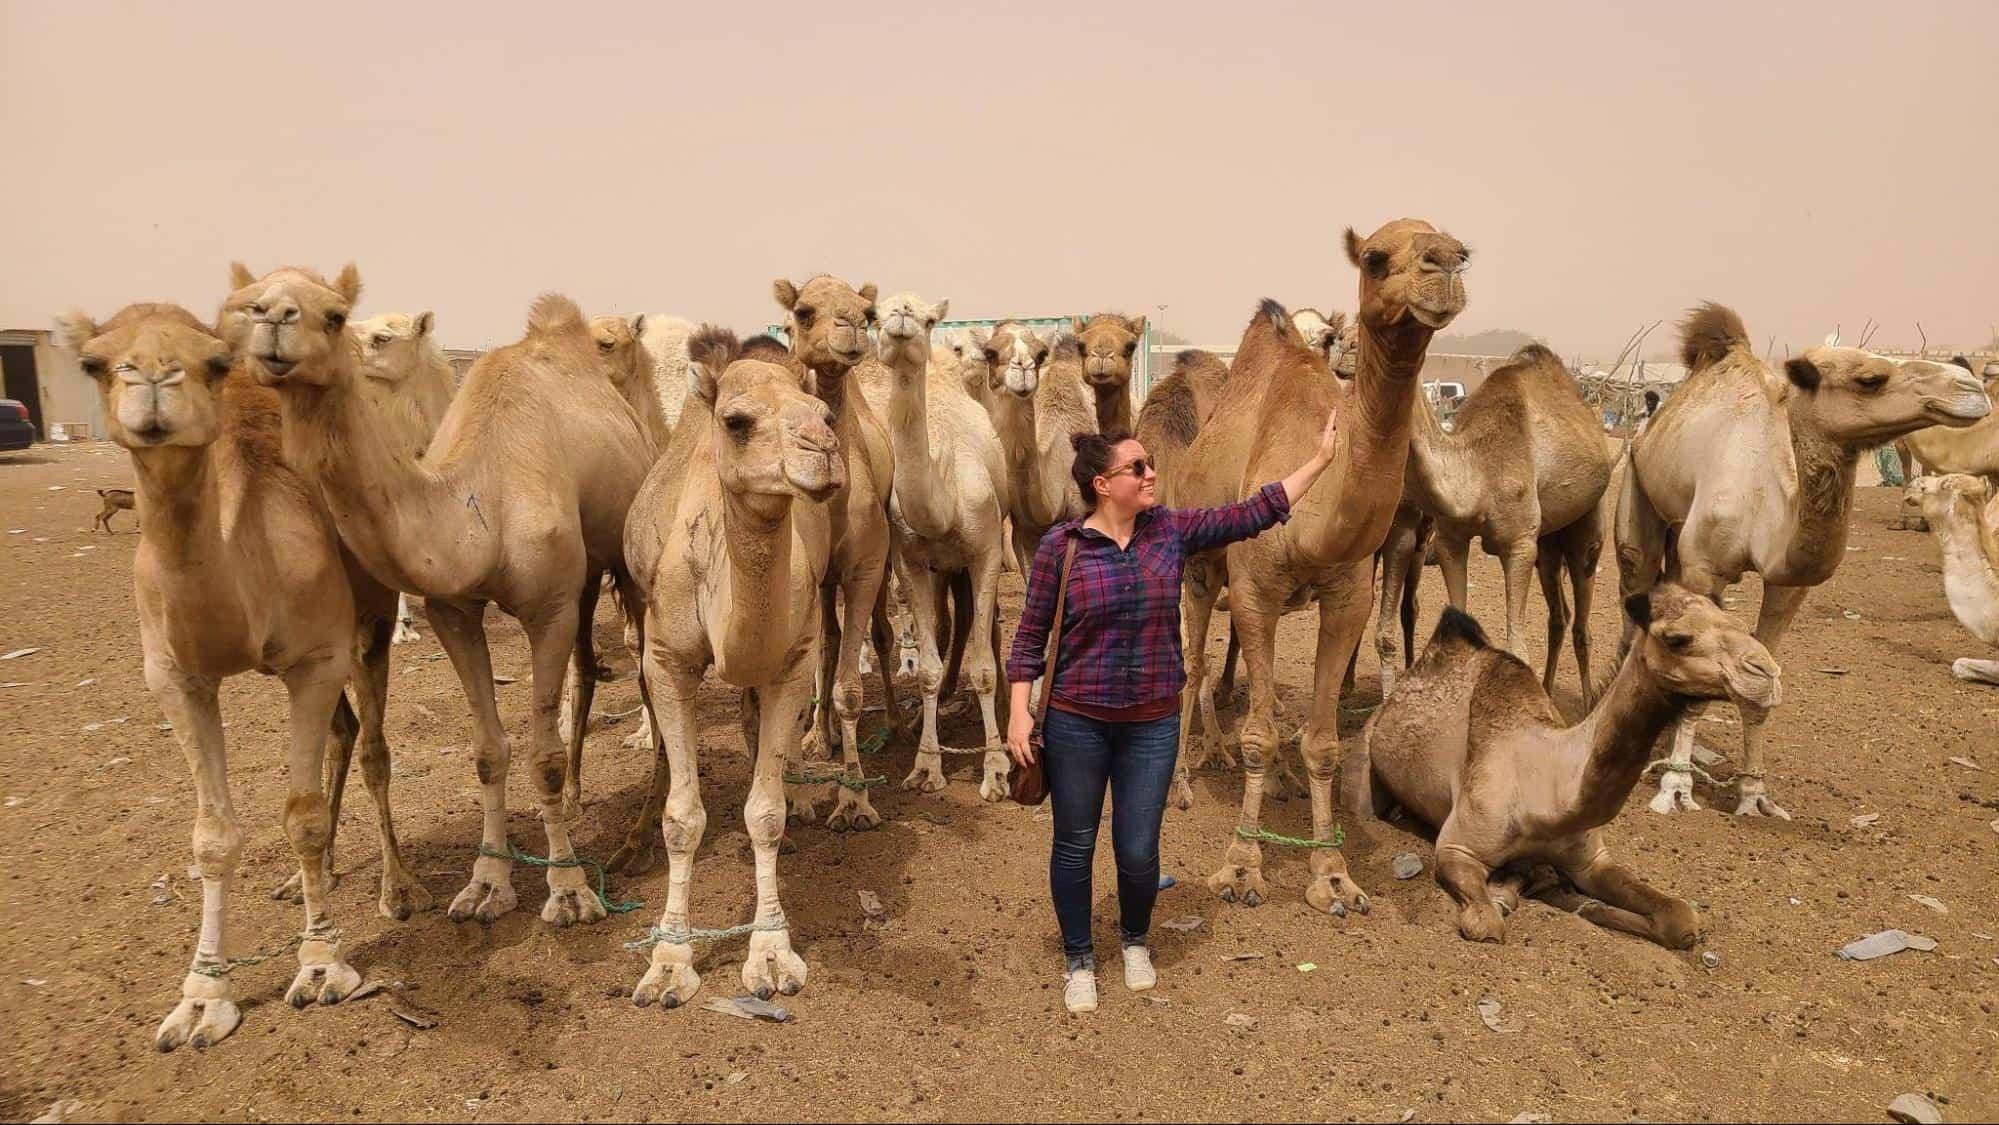 camel market near Nouakchott, Mauritania